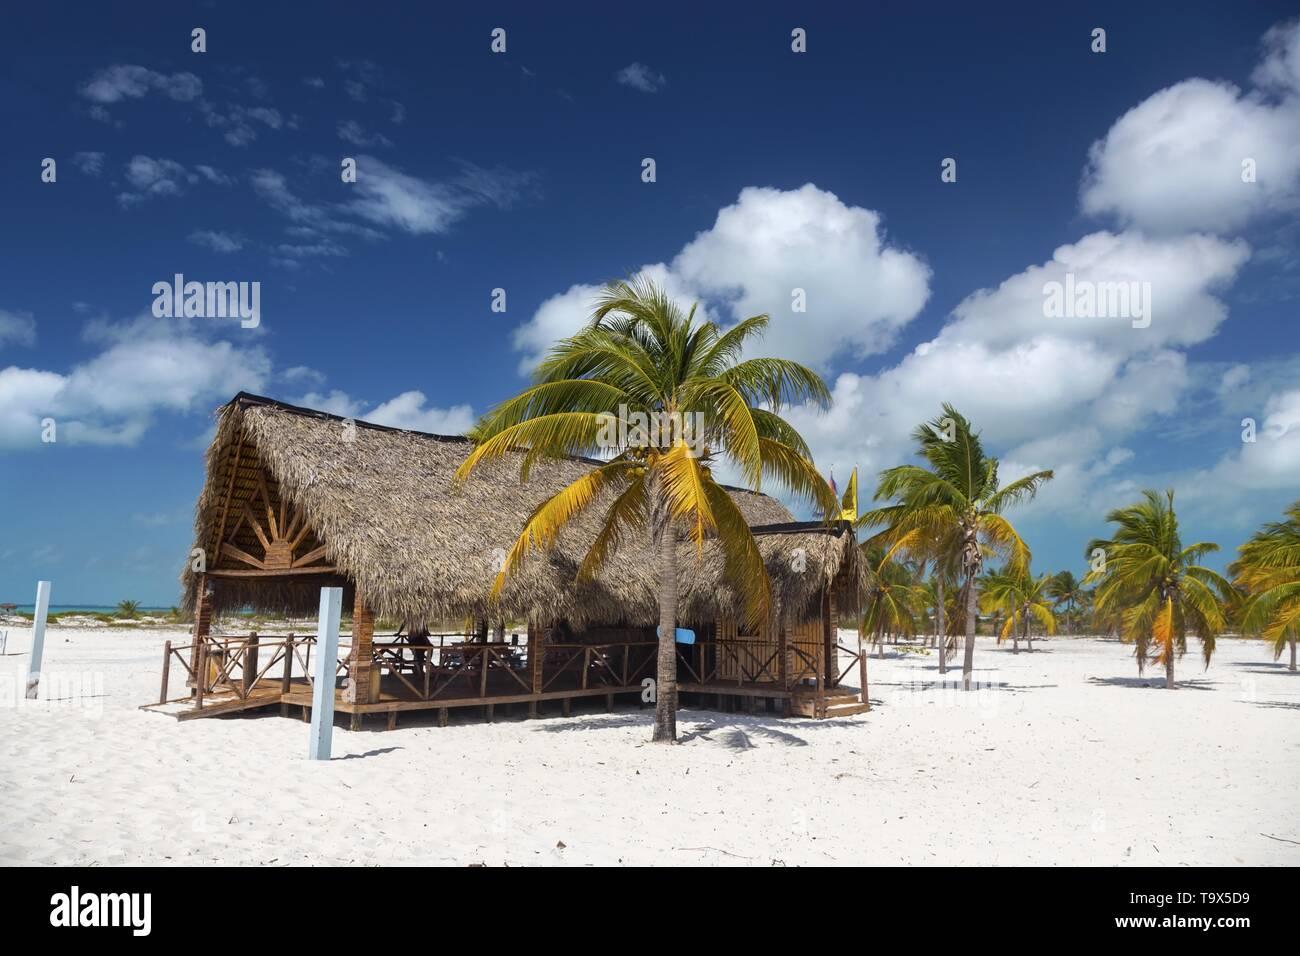 Beachfront Wooden Shack Bar and Grill Restaurant on Playa Sirena Tropical Beach on Cayo Largo Del Sur Tourist Resort Caribbean Sea Cuban Coast Stock Photo